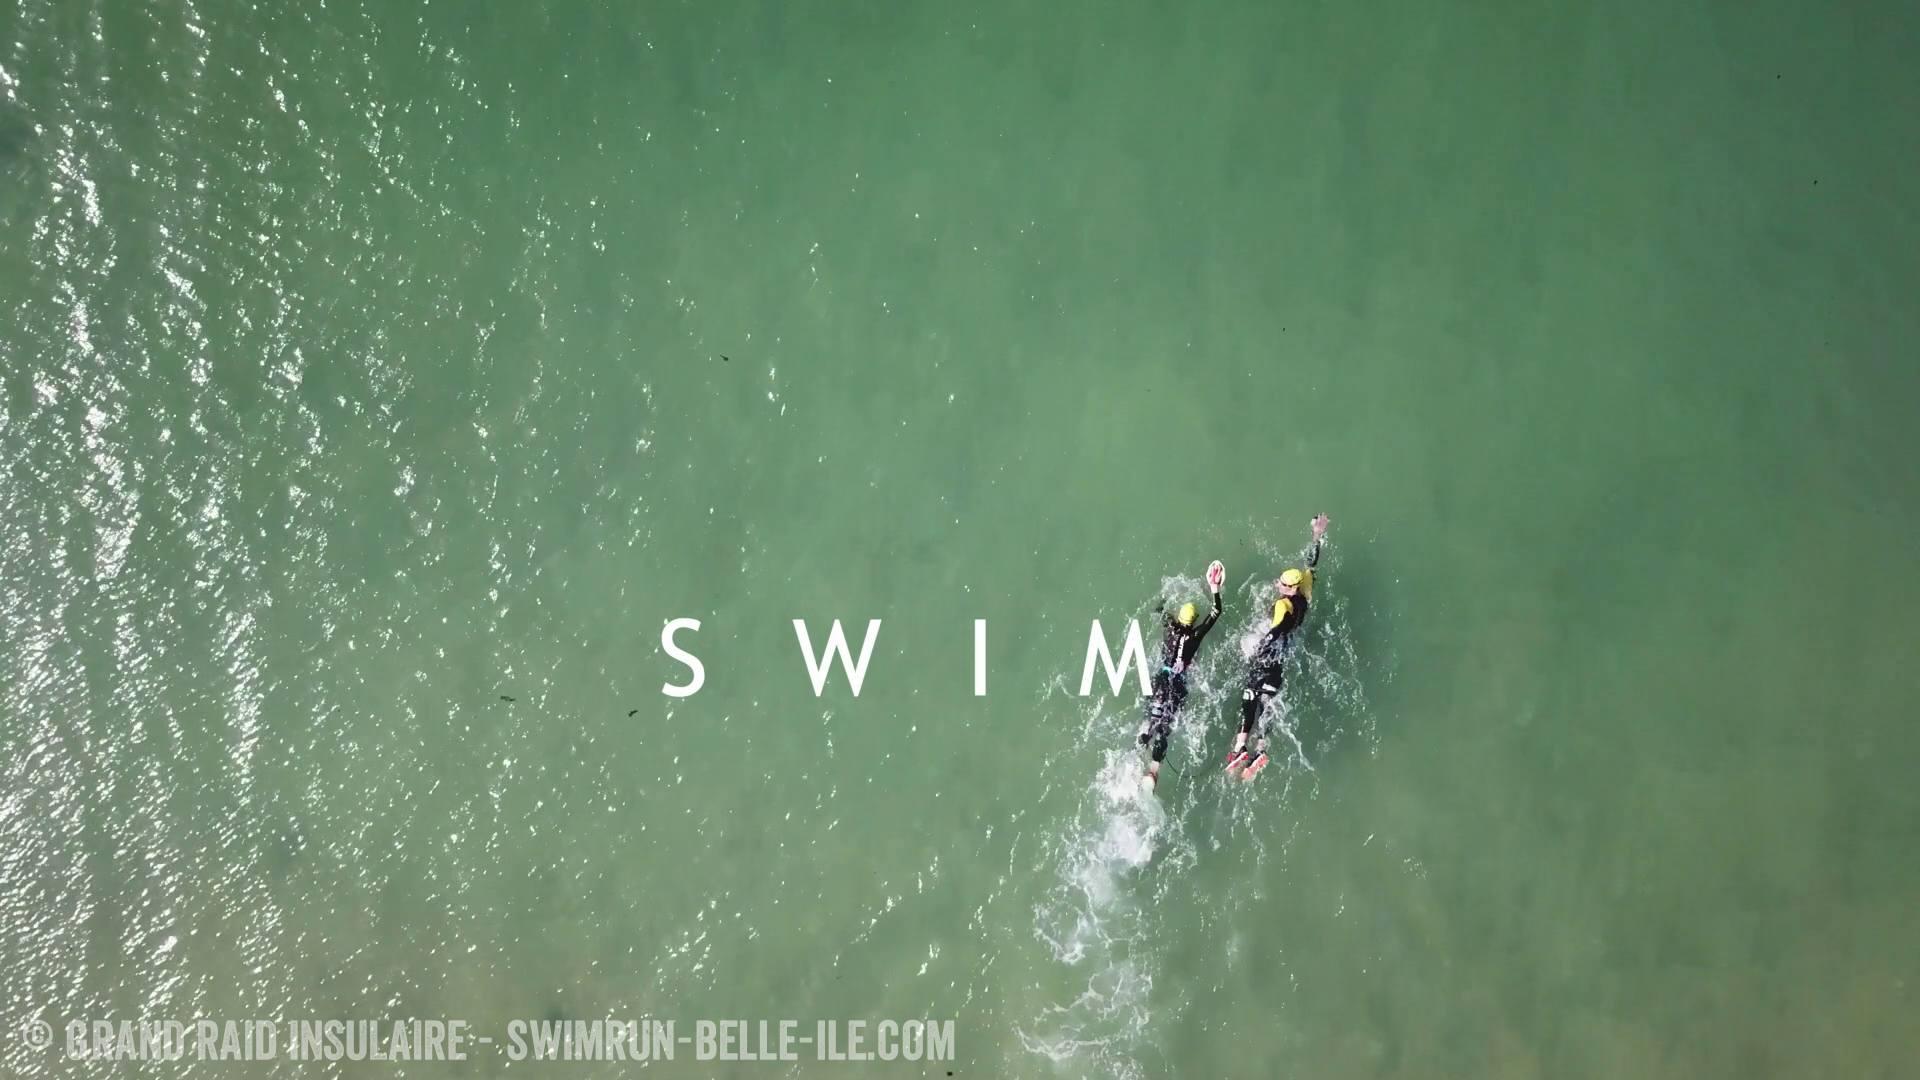 swimrun-hd_teaser_cr_resize_3